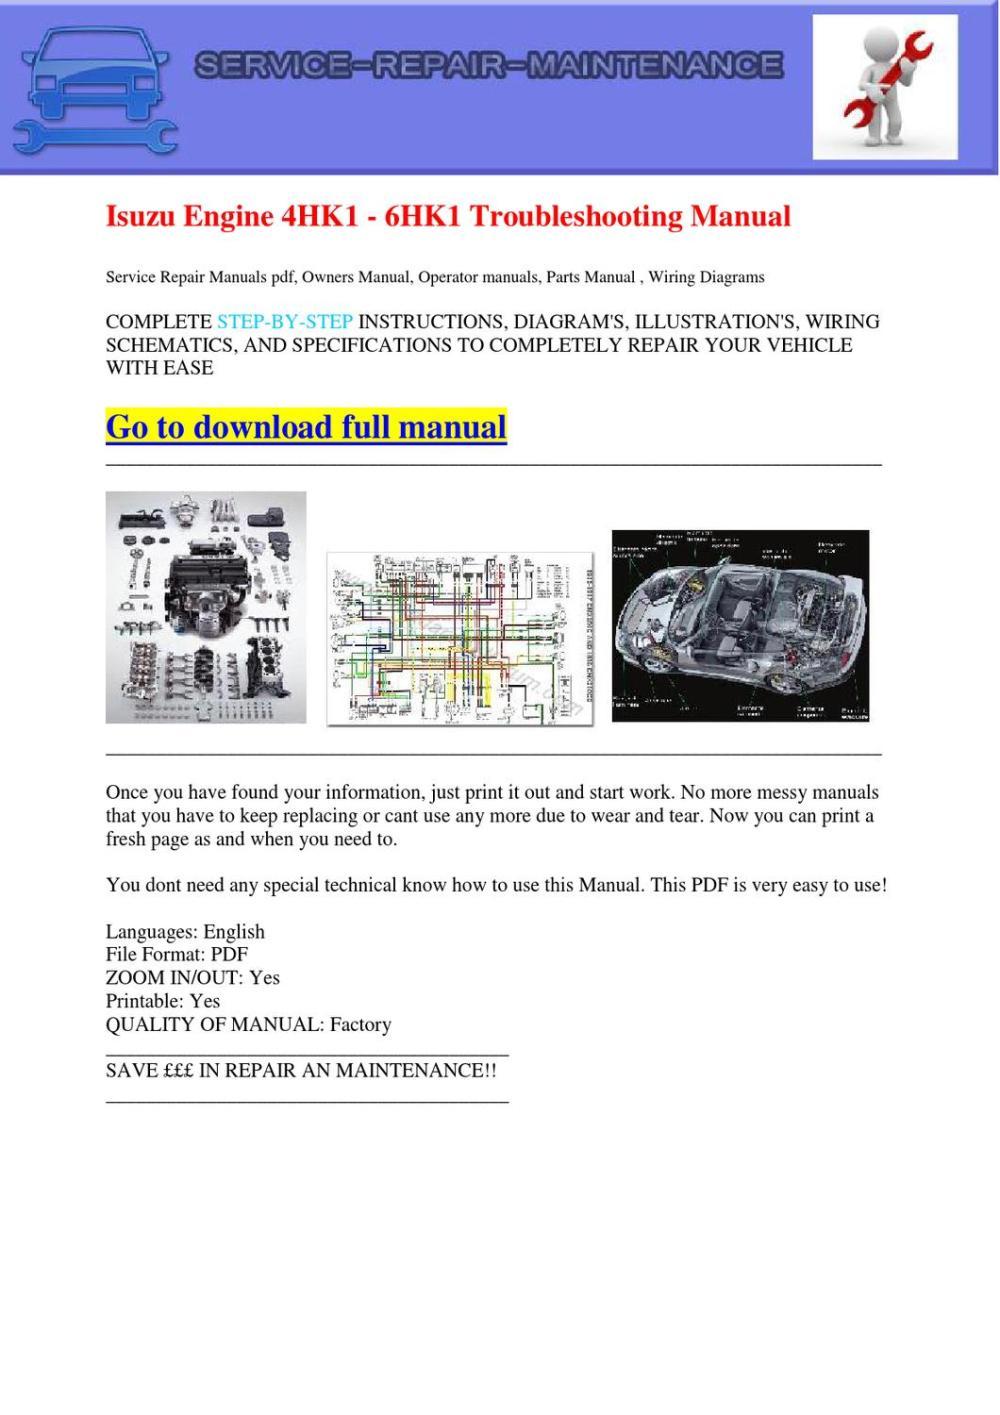 medium resolution of isuzu engine 4hk1 6hk1 troubleshooting manual by dernis castan issuu manual 4hk1 6hk1 isuzu repair manuals download wiring on isuzu 4hk1